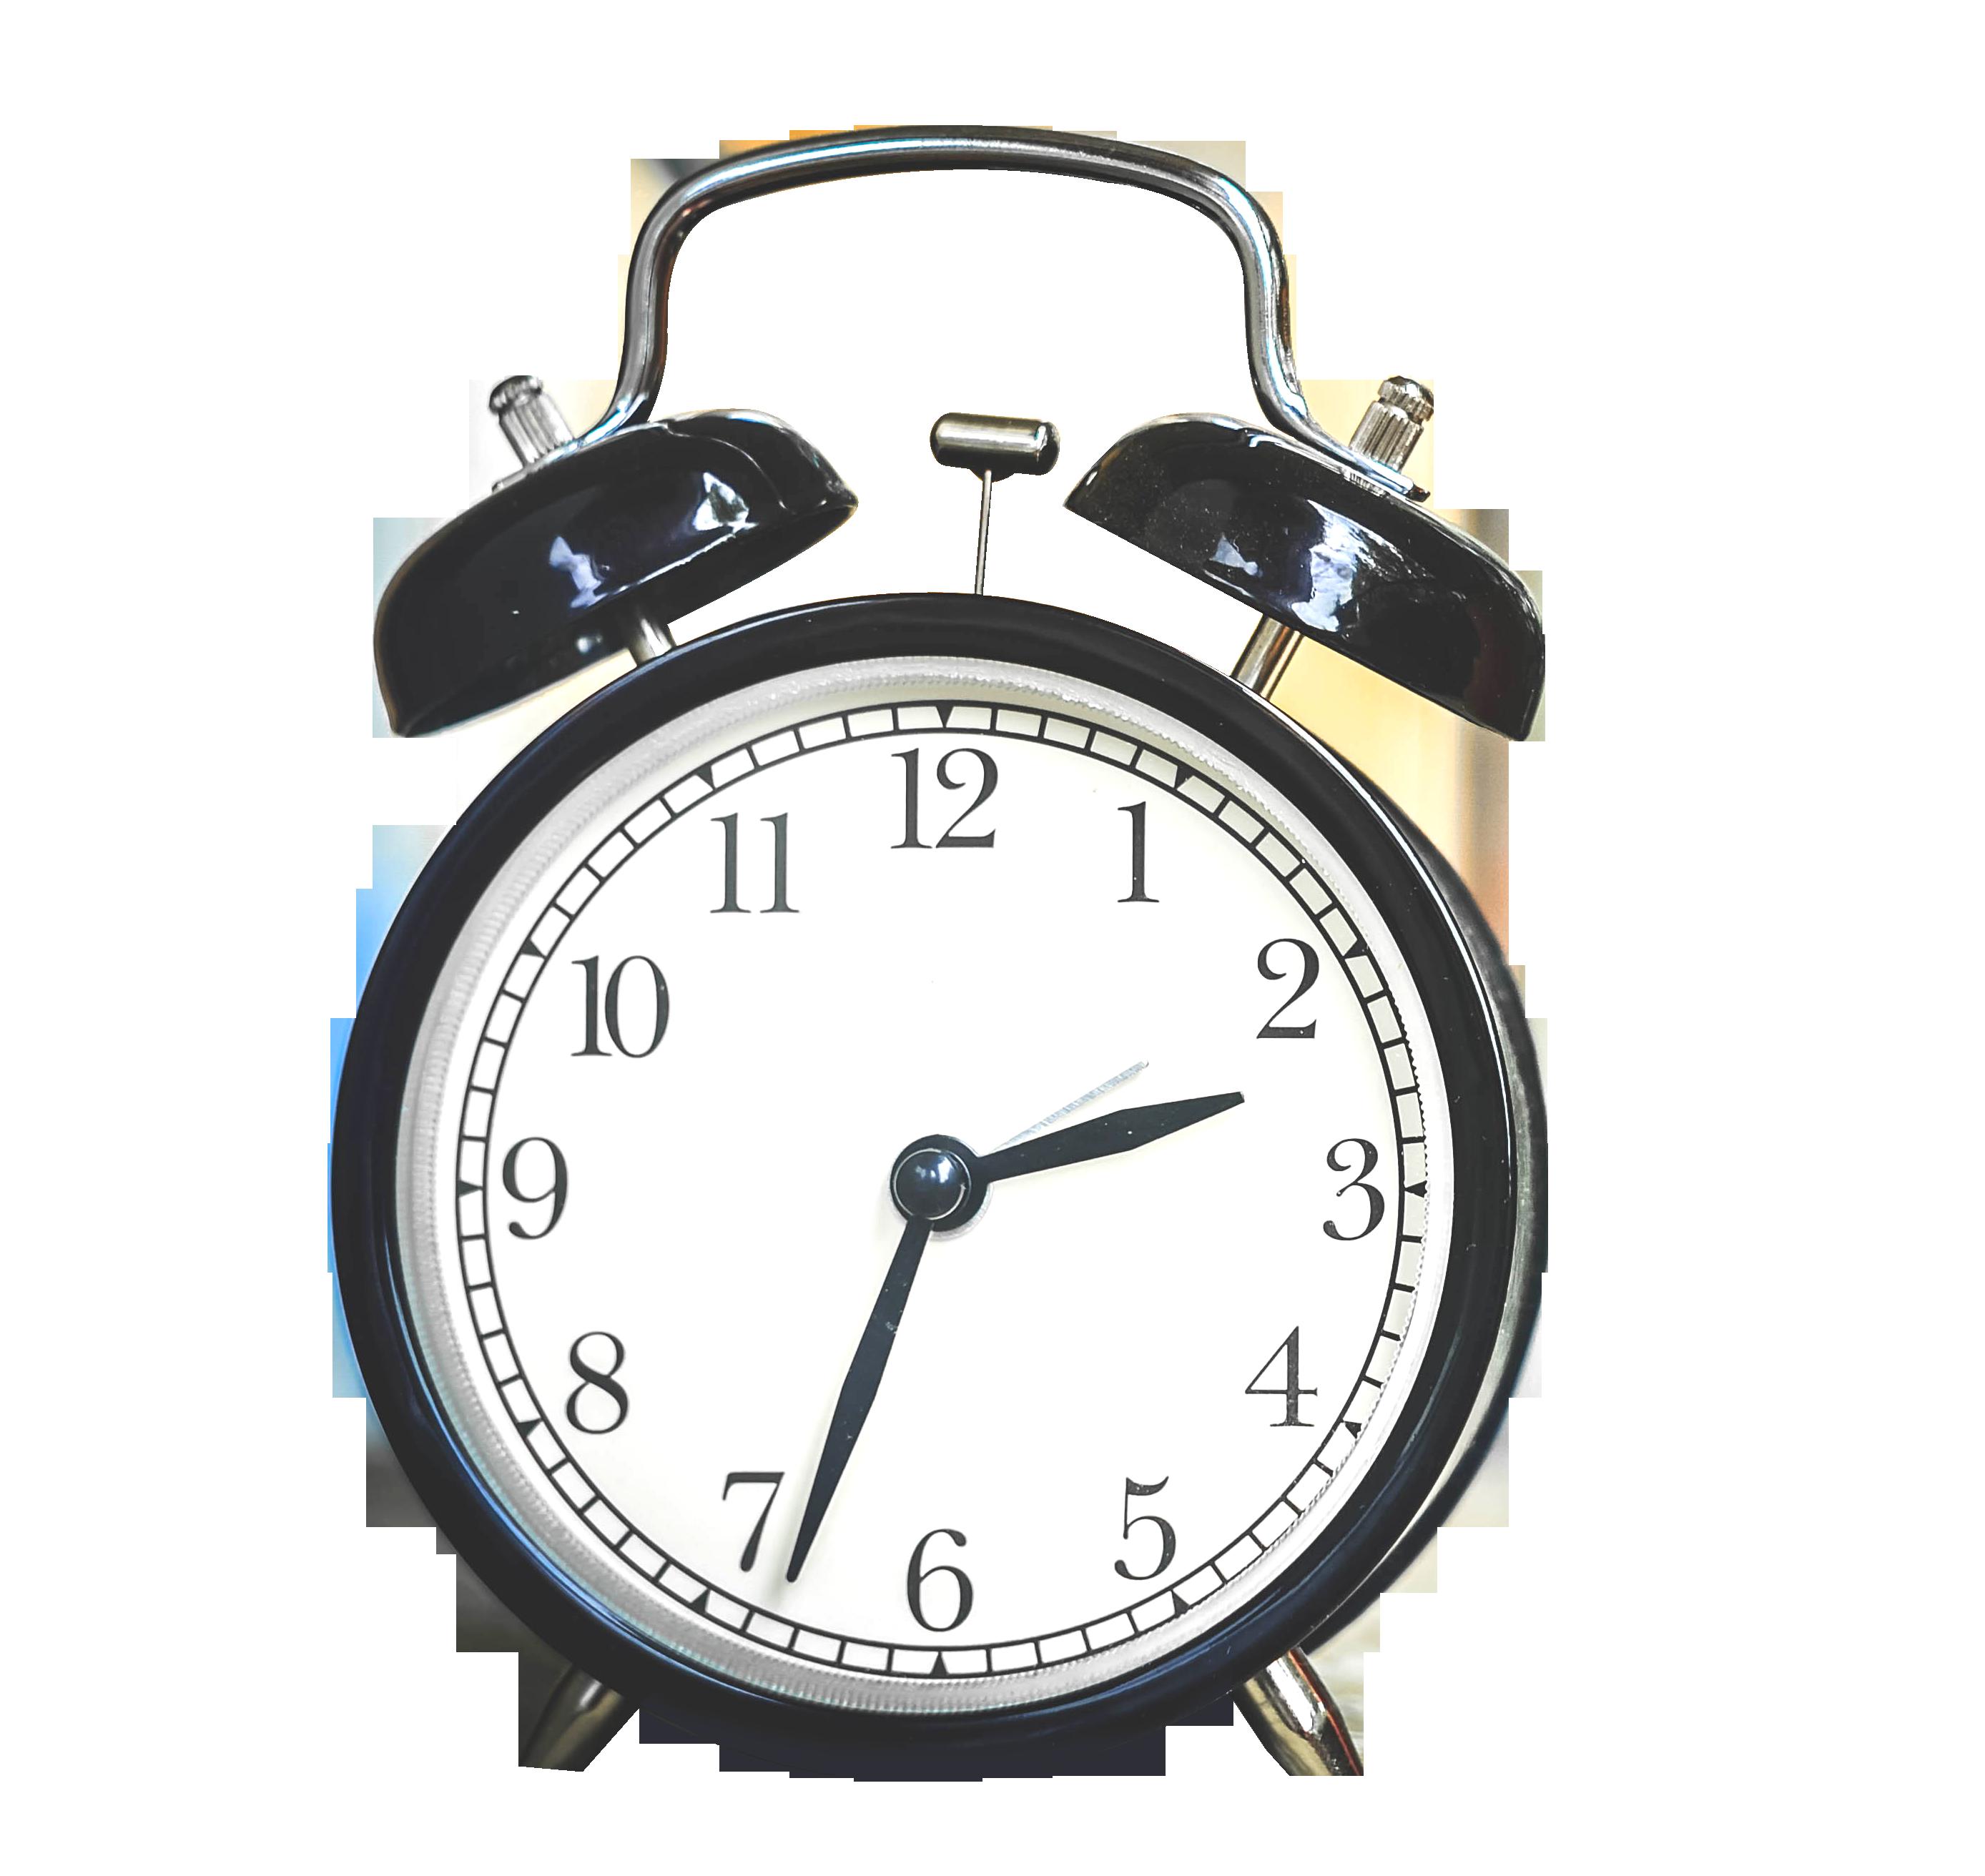 Clock clipart transparent background. Alarm png image best